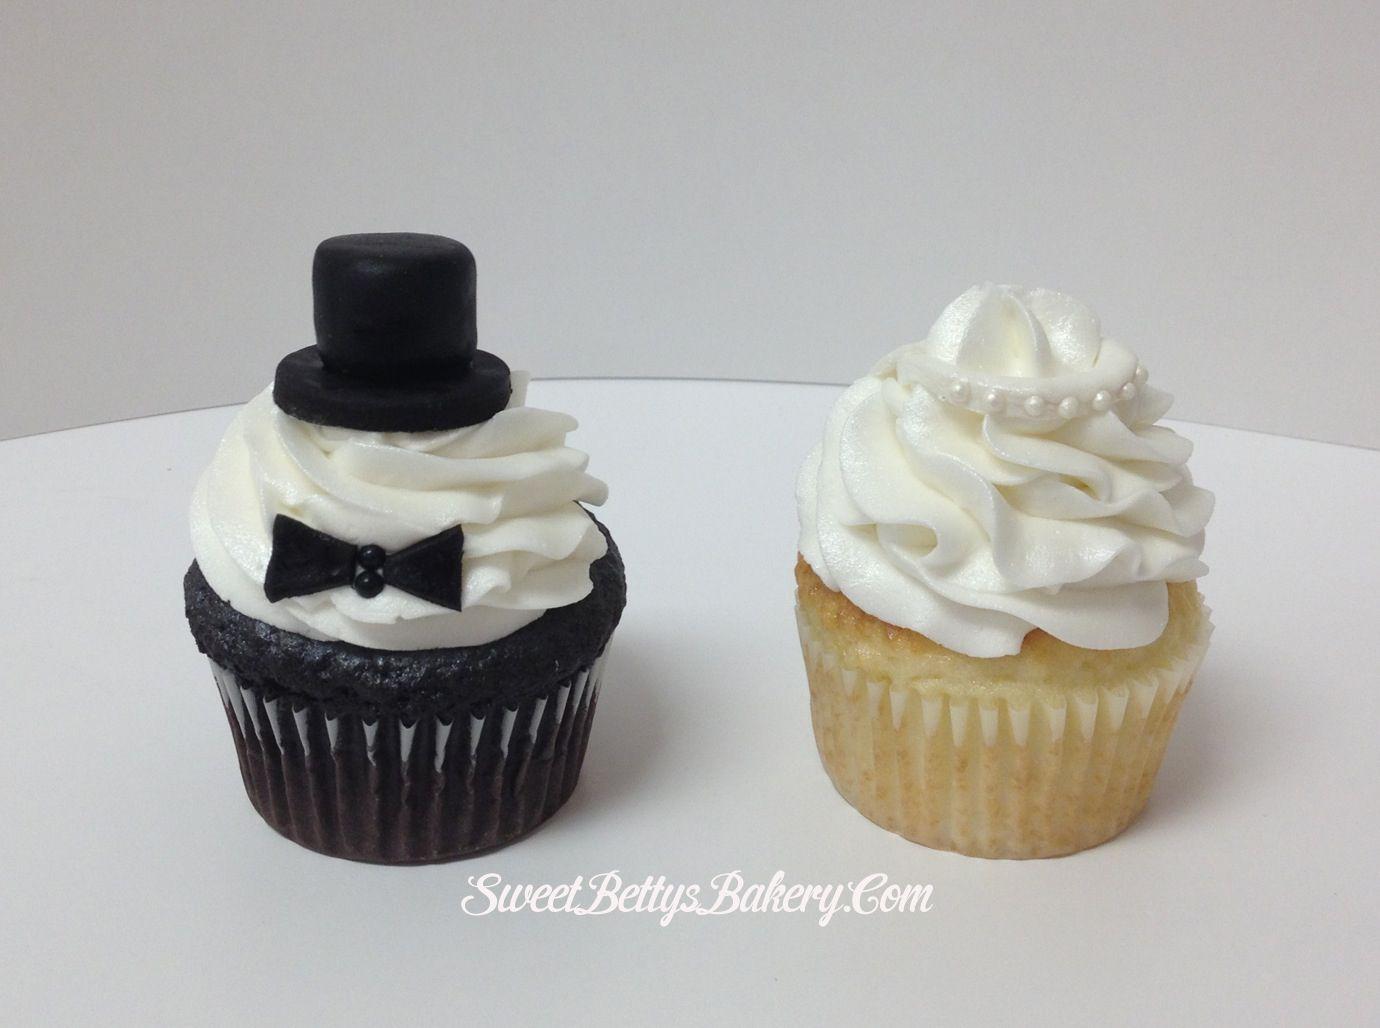 Wedding Cake Cupcake Ideas: Baked Goods & Sweet Treats